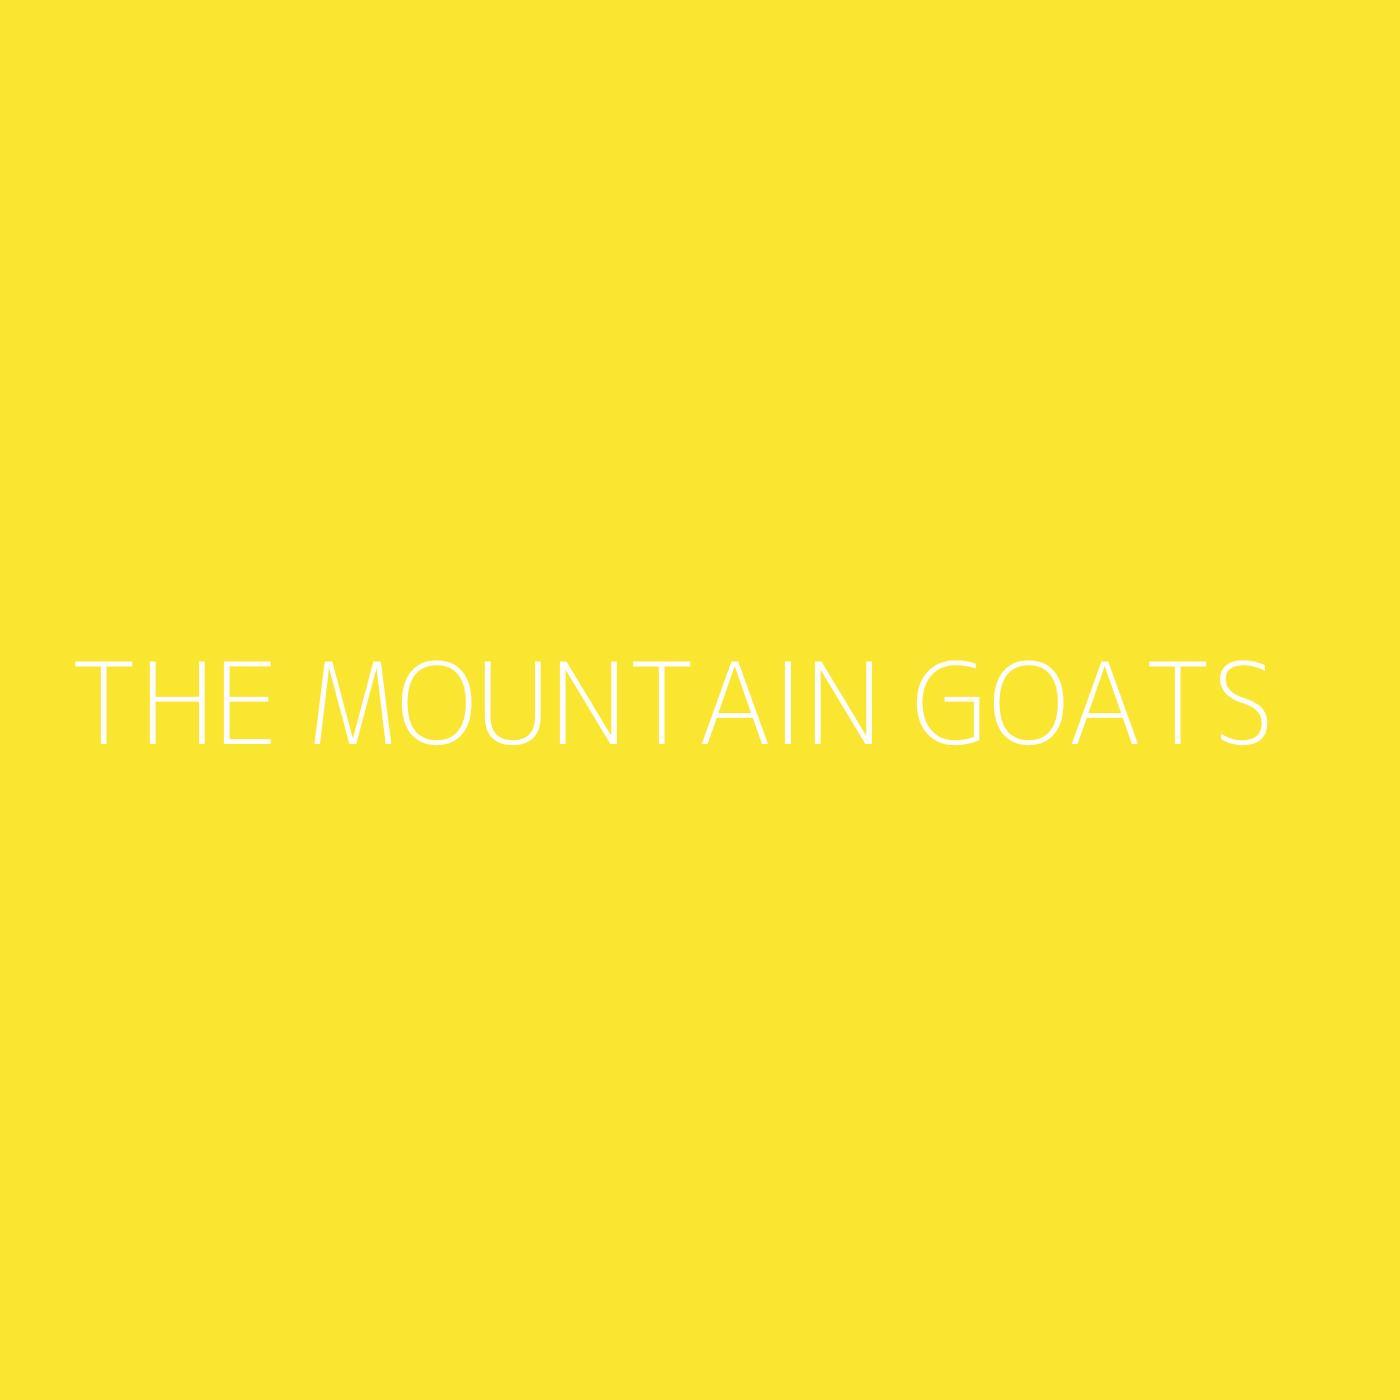 The Mountain Goats Playlist Artwork